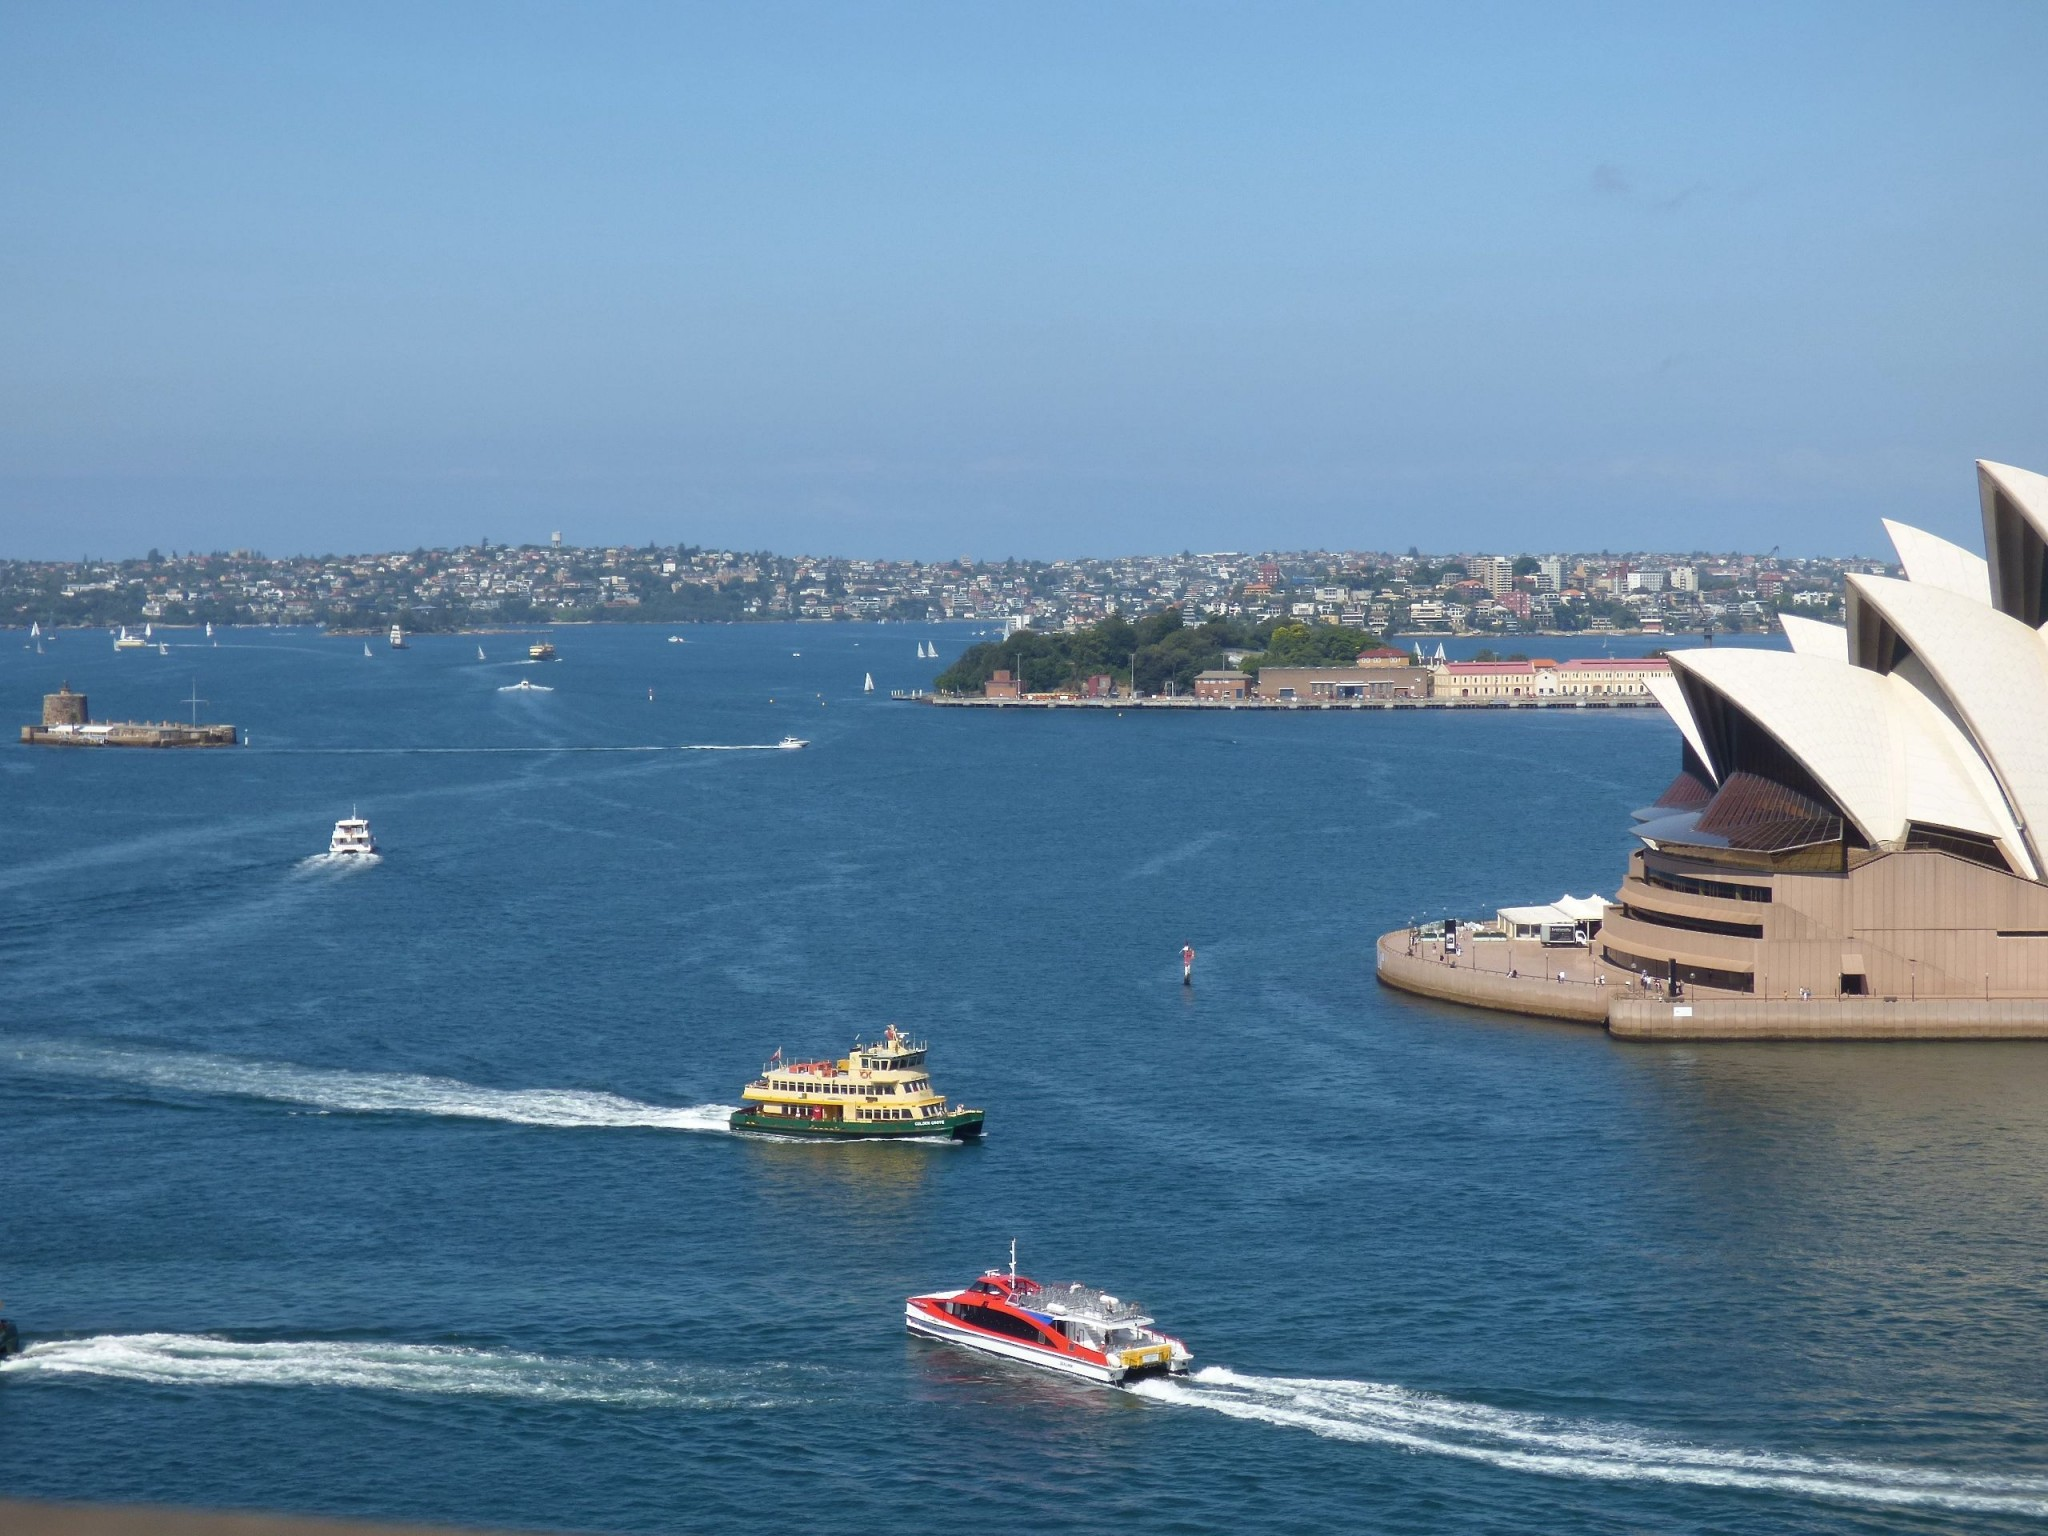 Oopperatalo Sydney